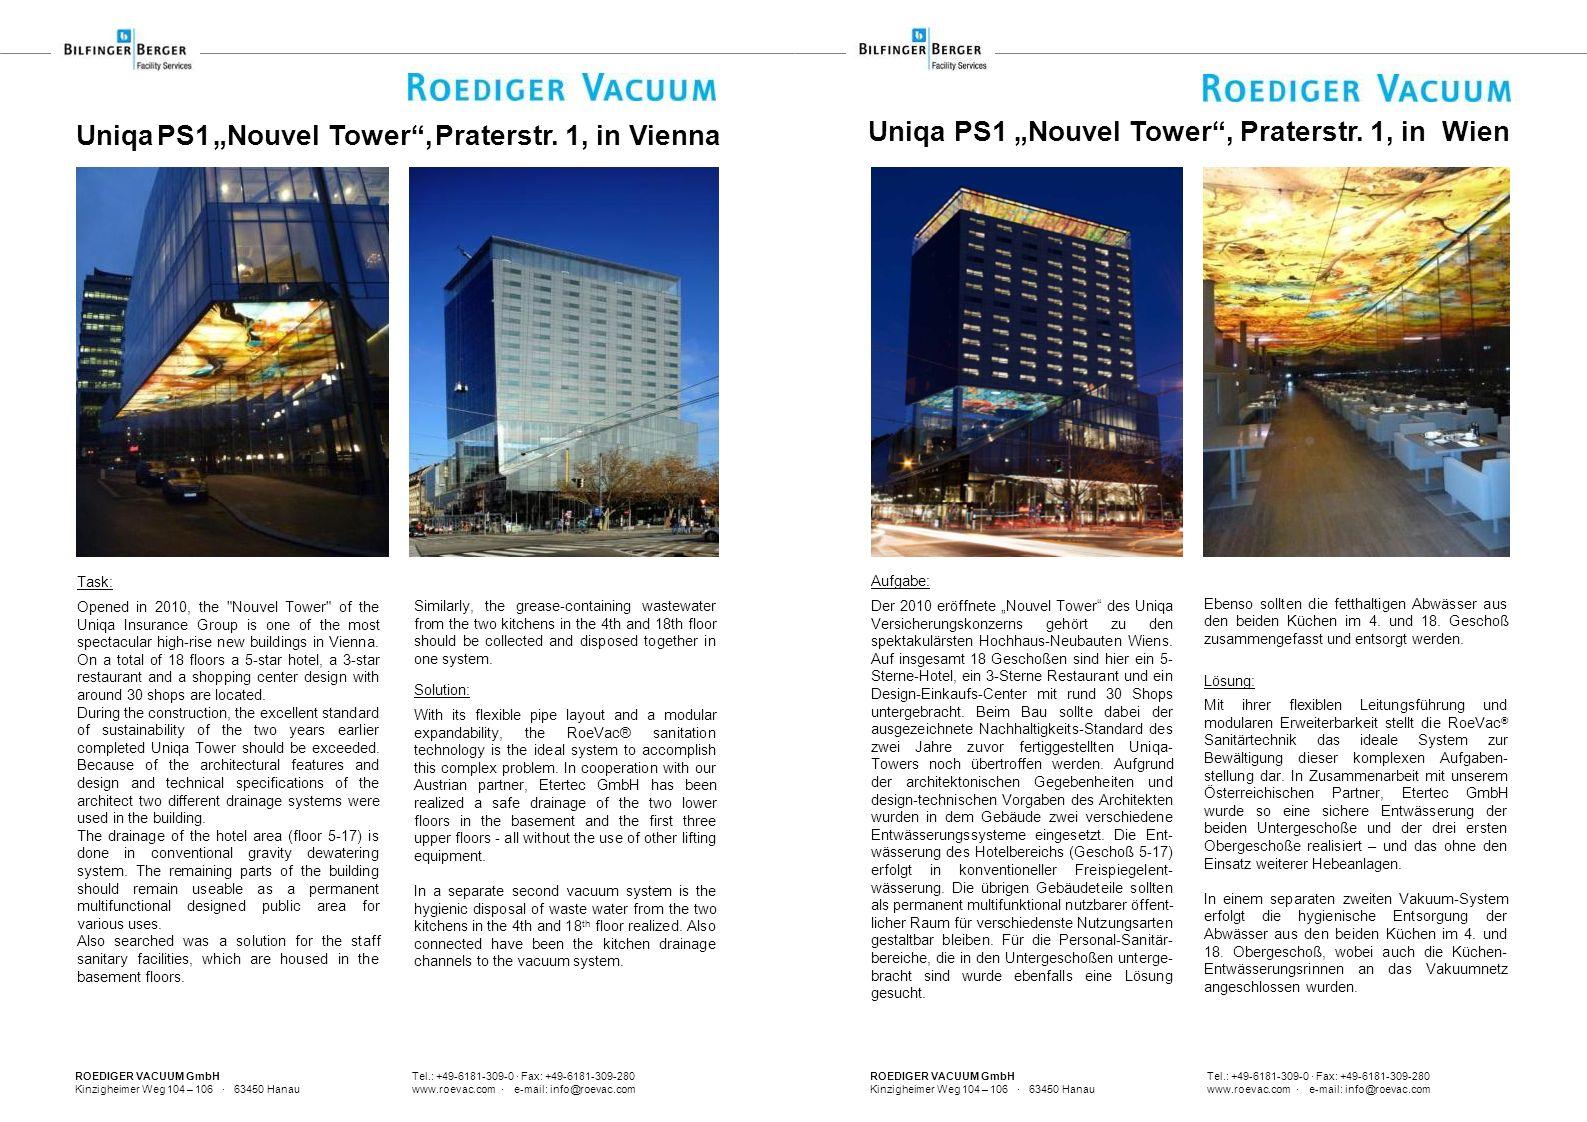 ROEDIGER VACUUM GmbH Tel.: +49-6181-309-0 · Fax: +49-6181-309-280 Kinzigheimer Weg 104 – 106 · 63450 Hanau www.roevac.com · e-mail: info@roevac.com Un